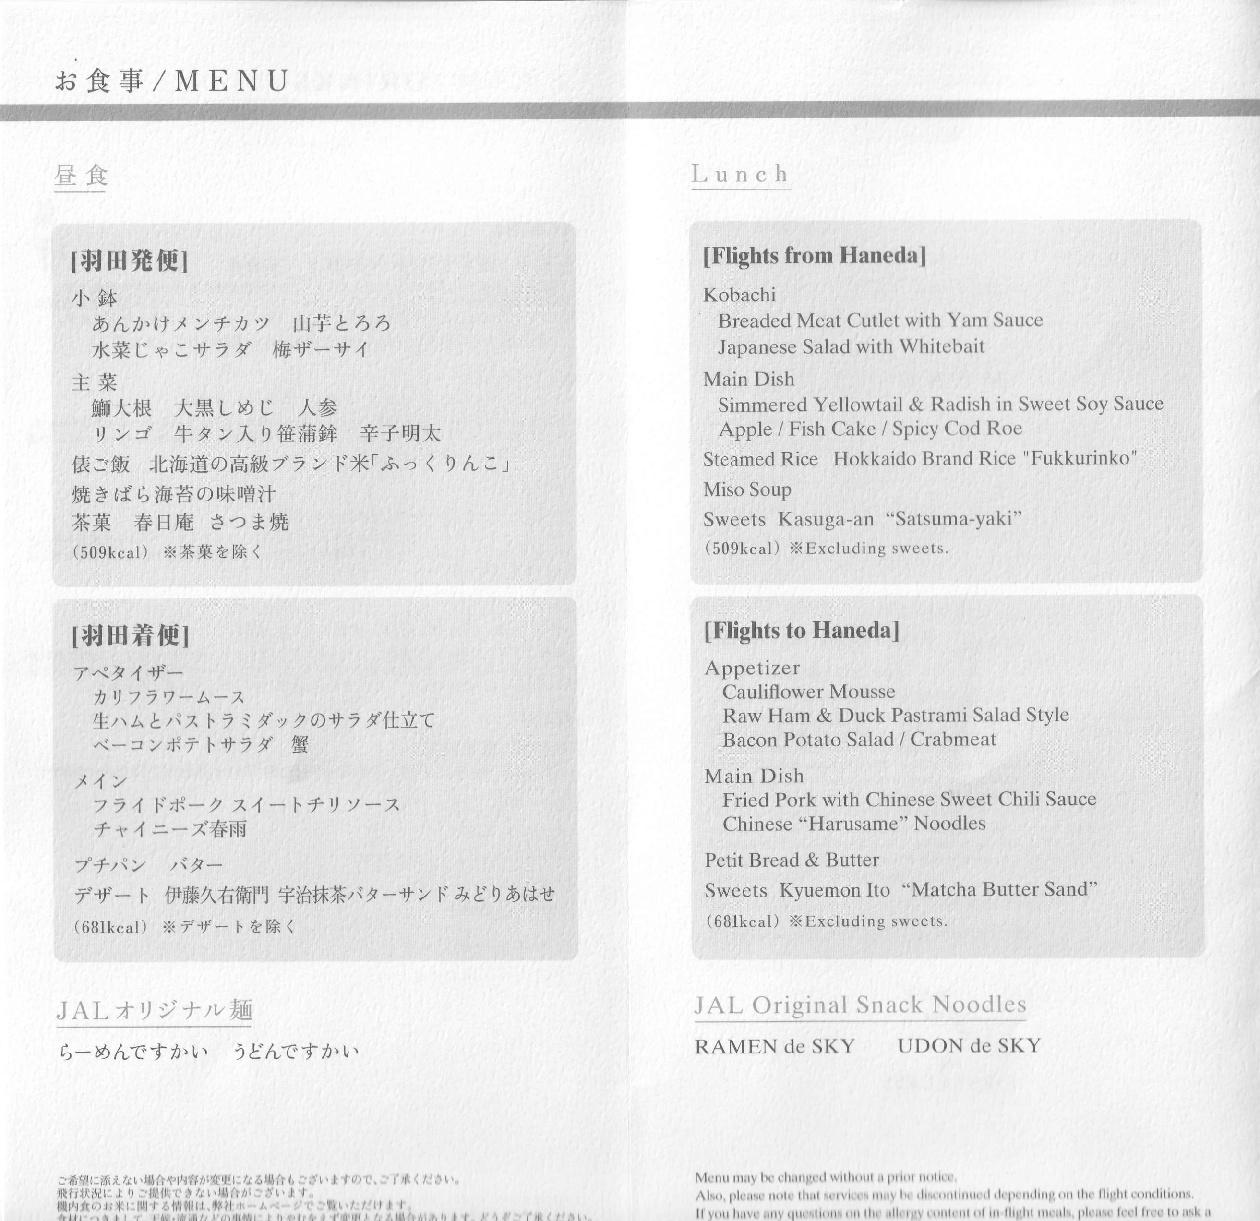 jl_menu_5